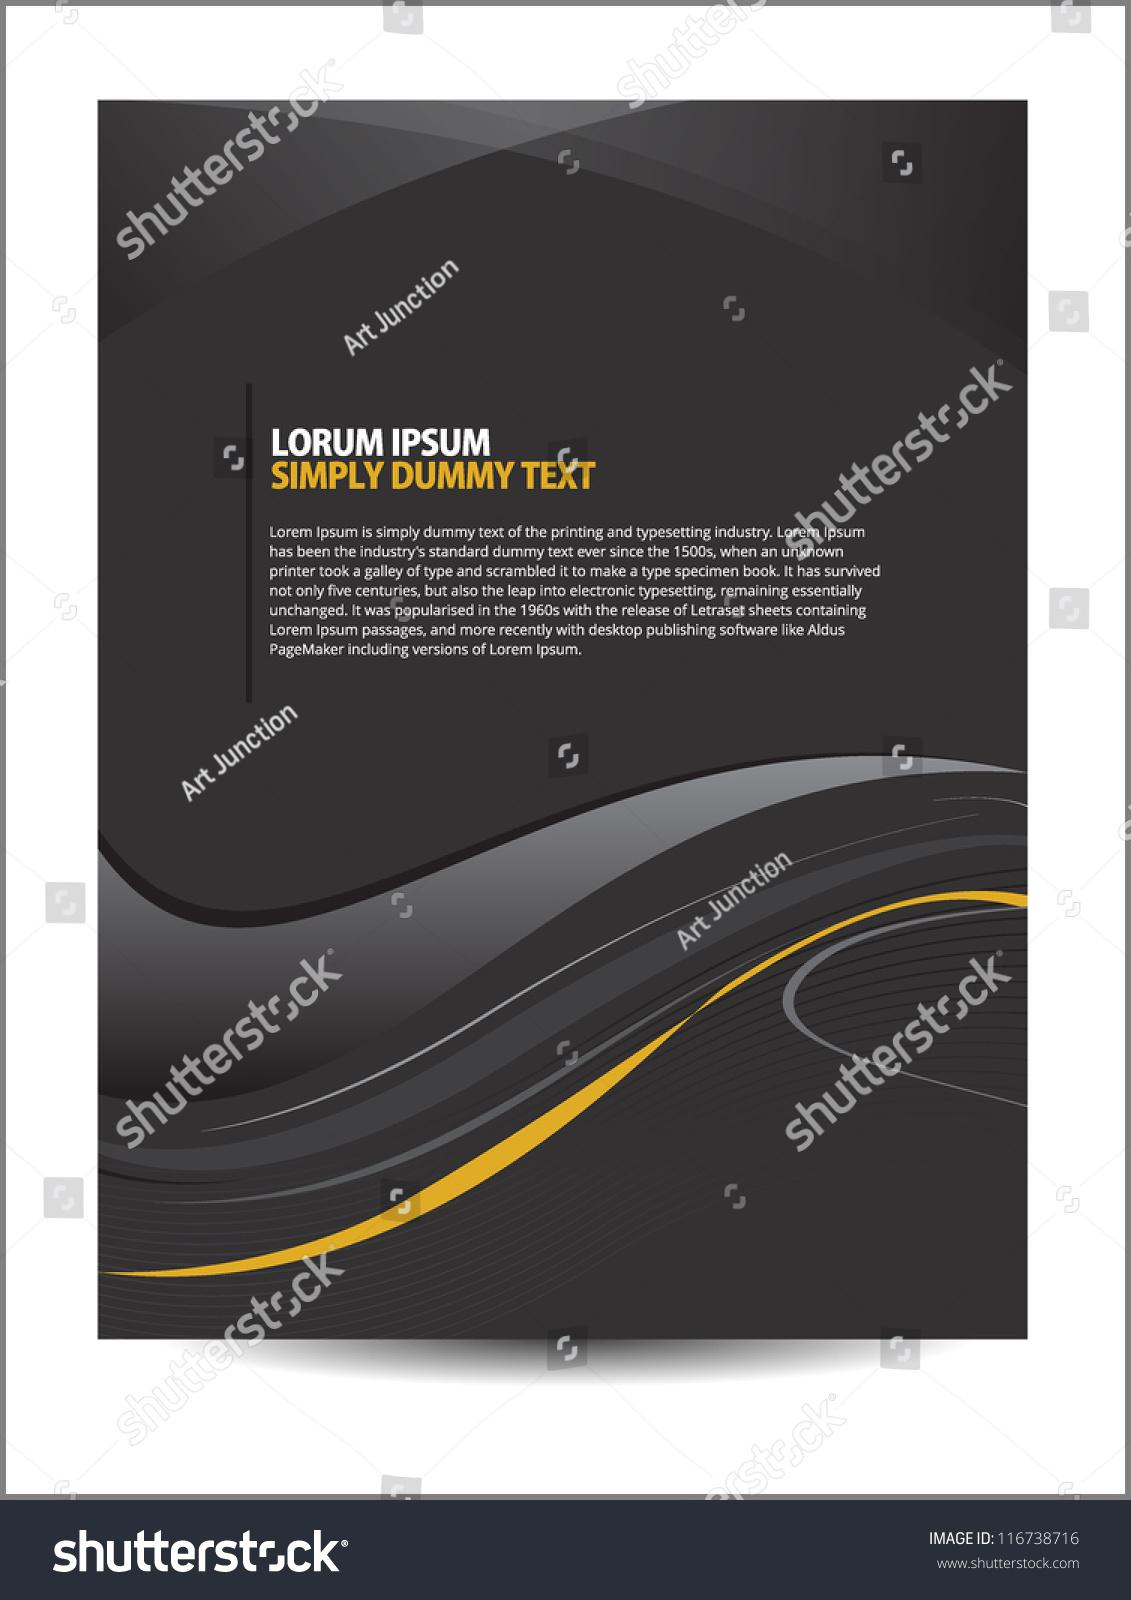 Professional Corporate Flyer Design Beautiful Design Vector – Professional Corporate Flyer